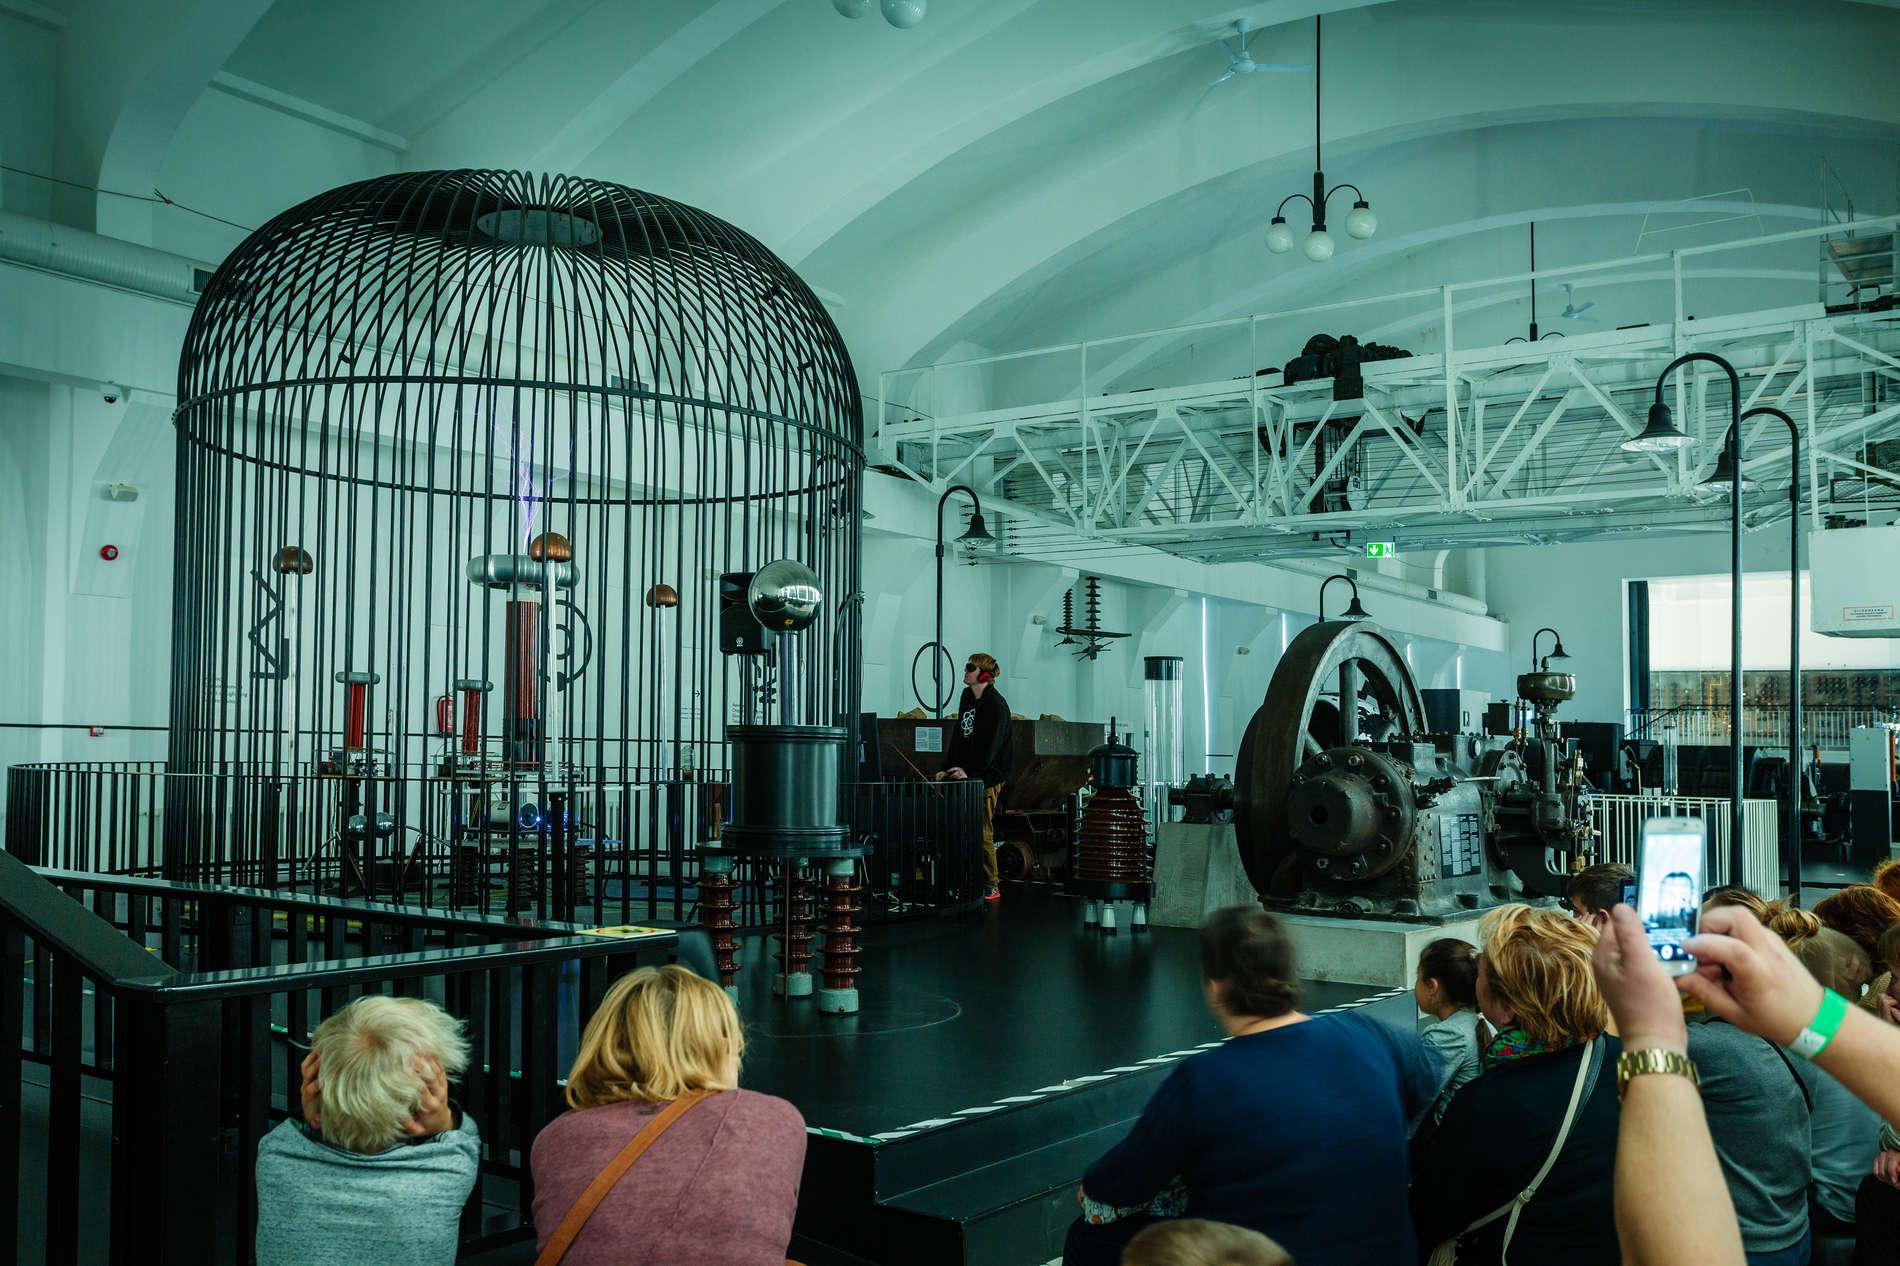 Flash demonstartion at the Energy Discovery Centre in Tallinn, Estonia